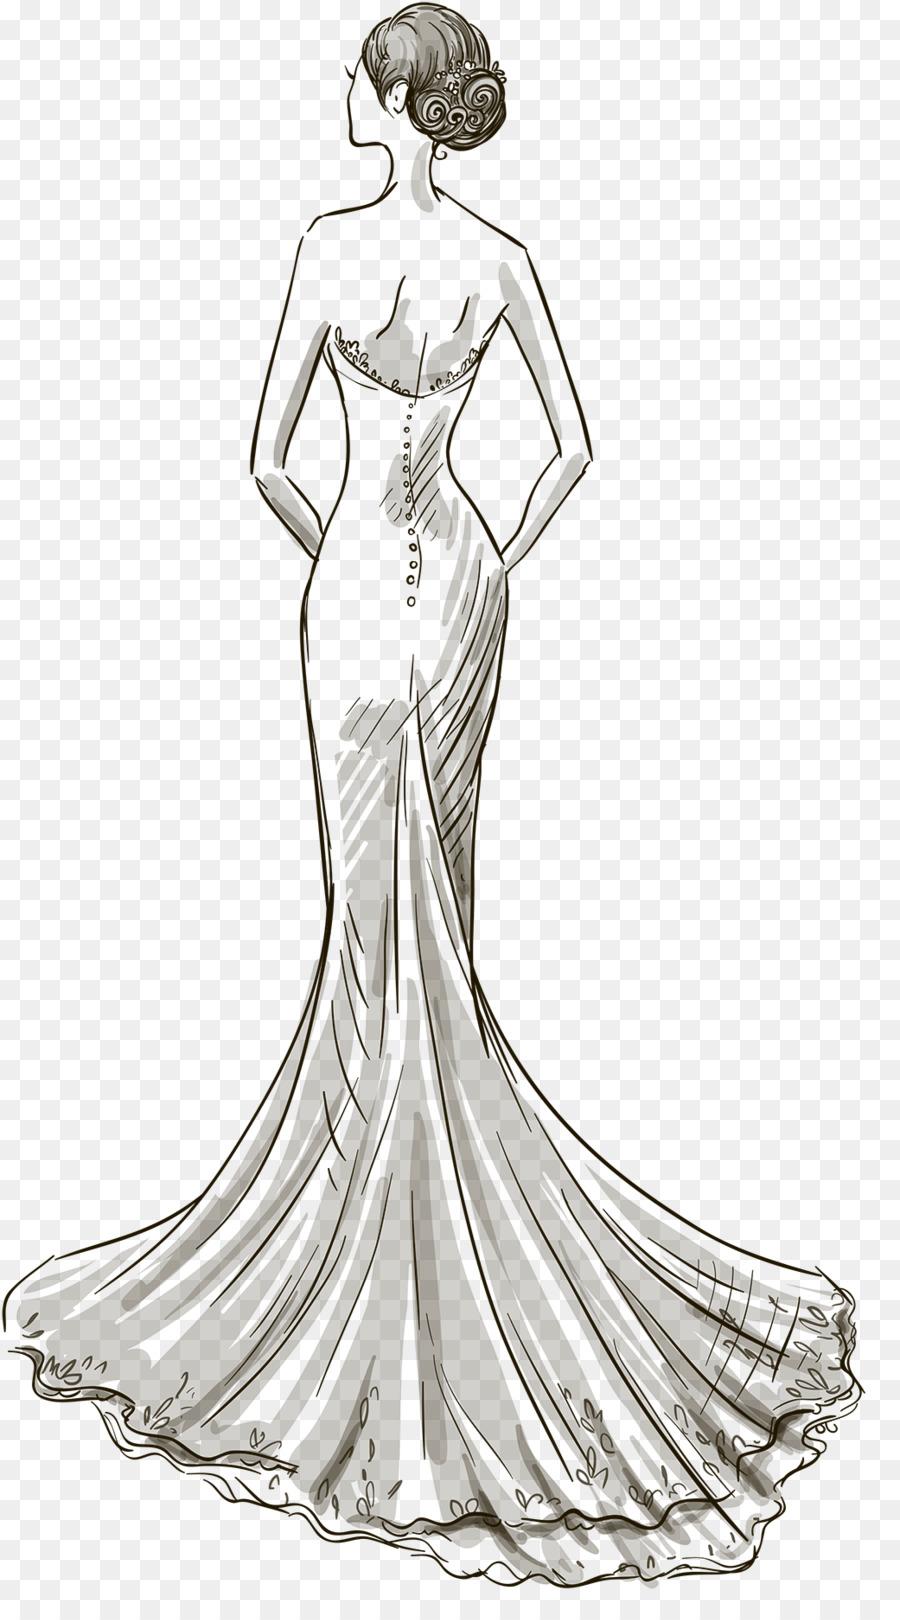 Wedding dress Drawing - dress png download - 1041*1854 - Free ...